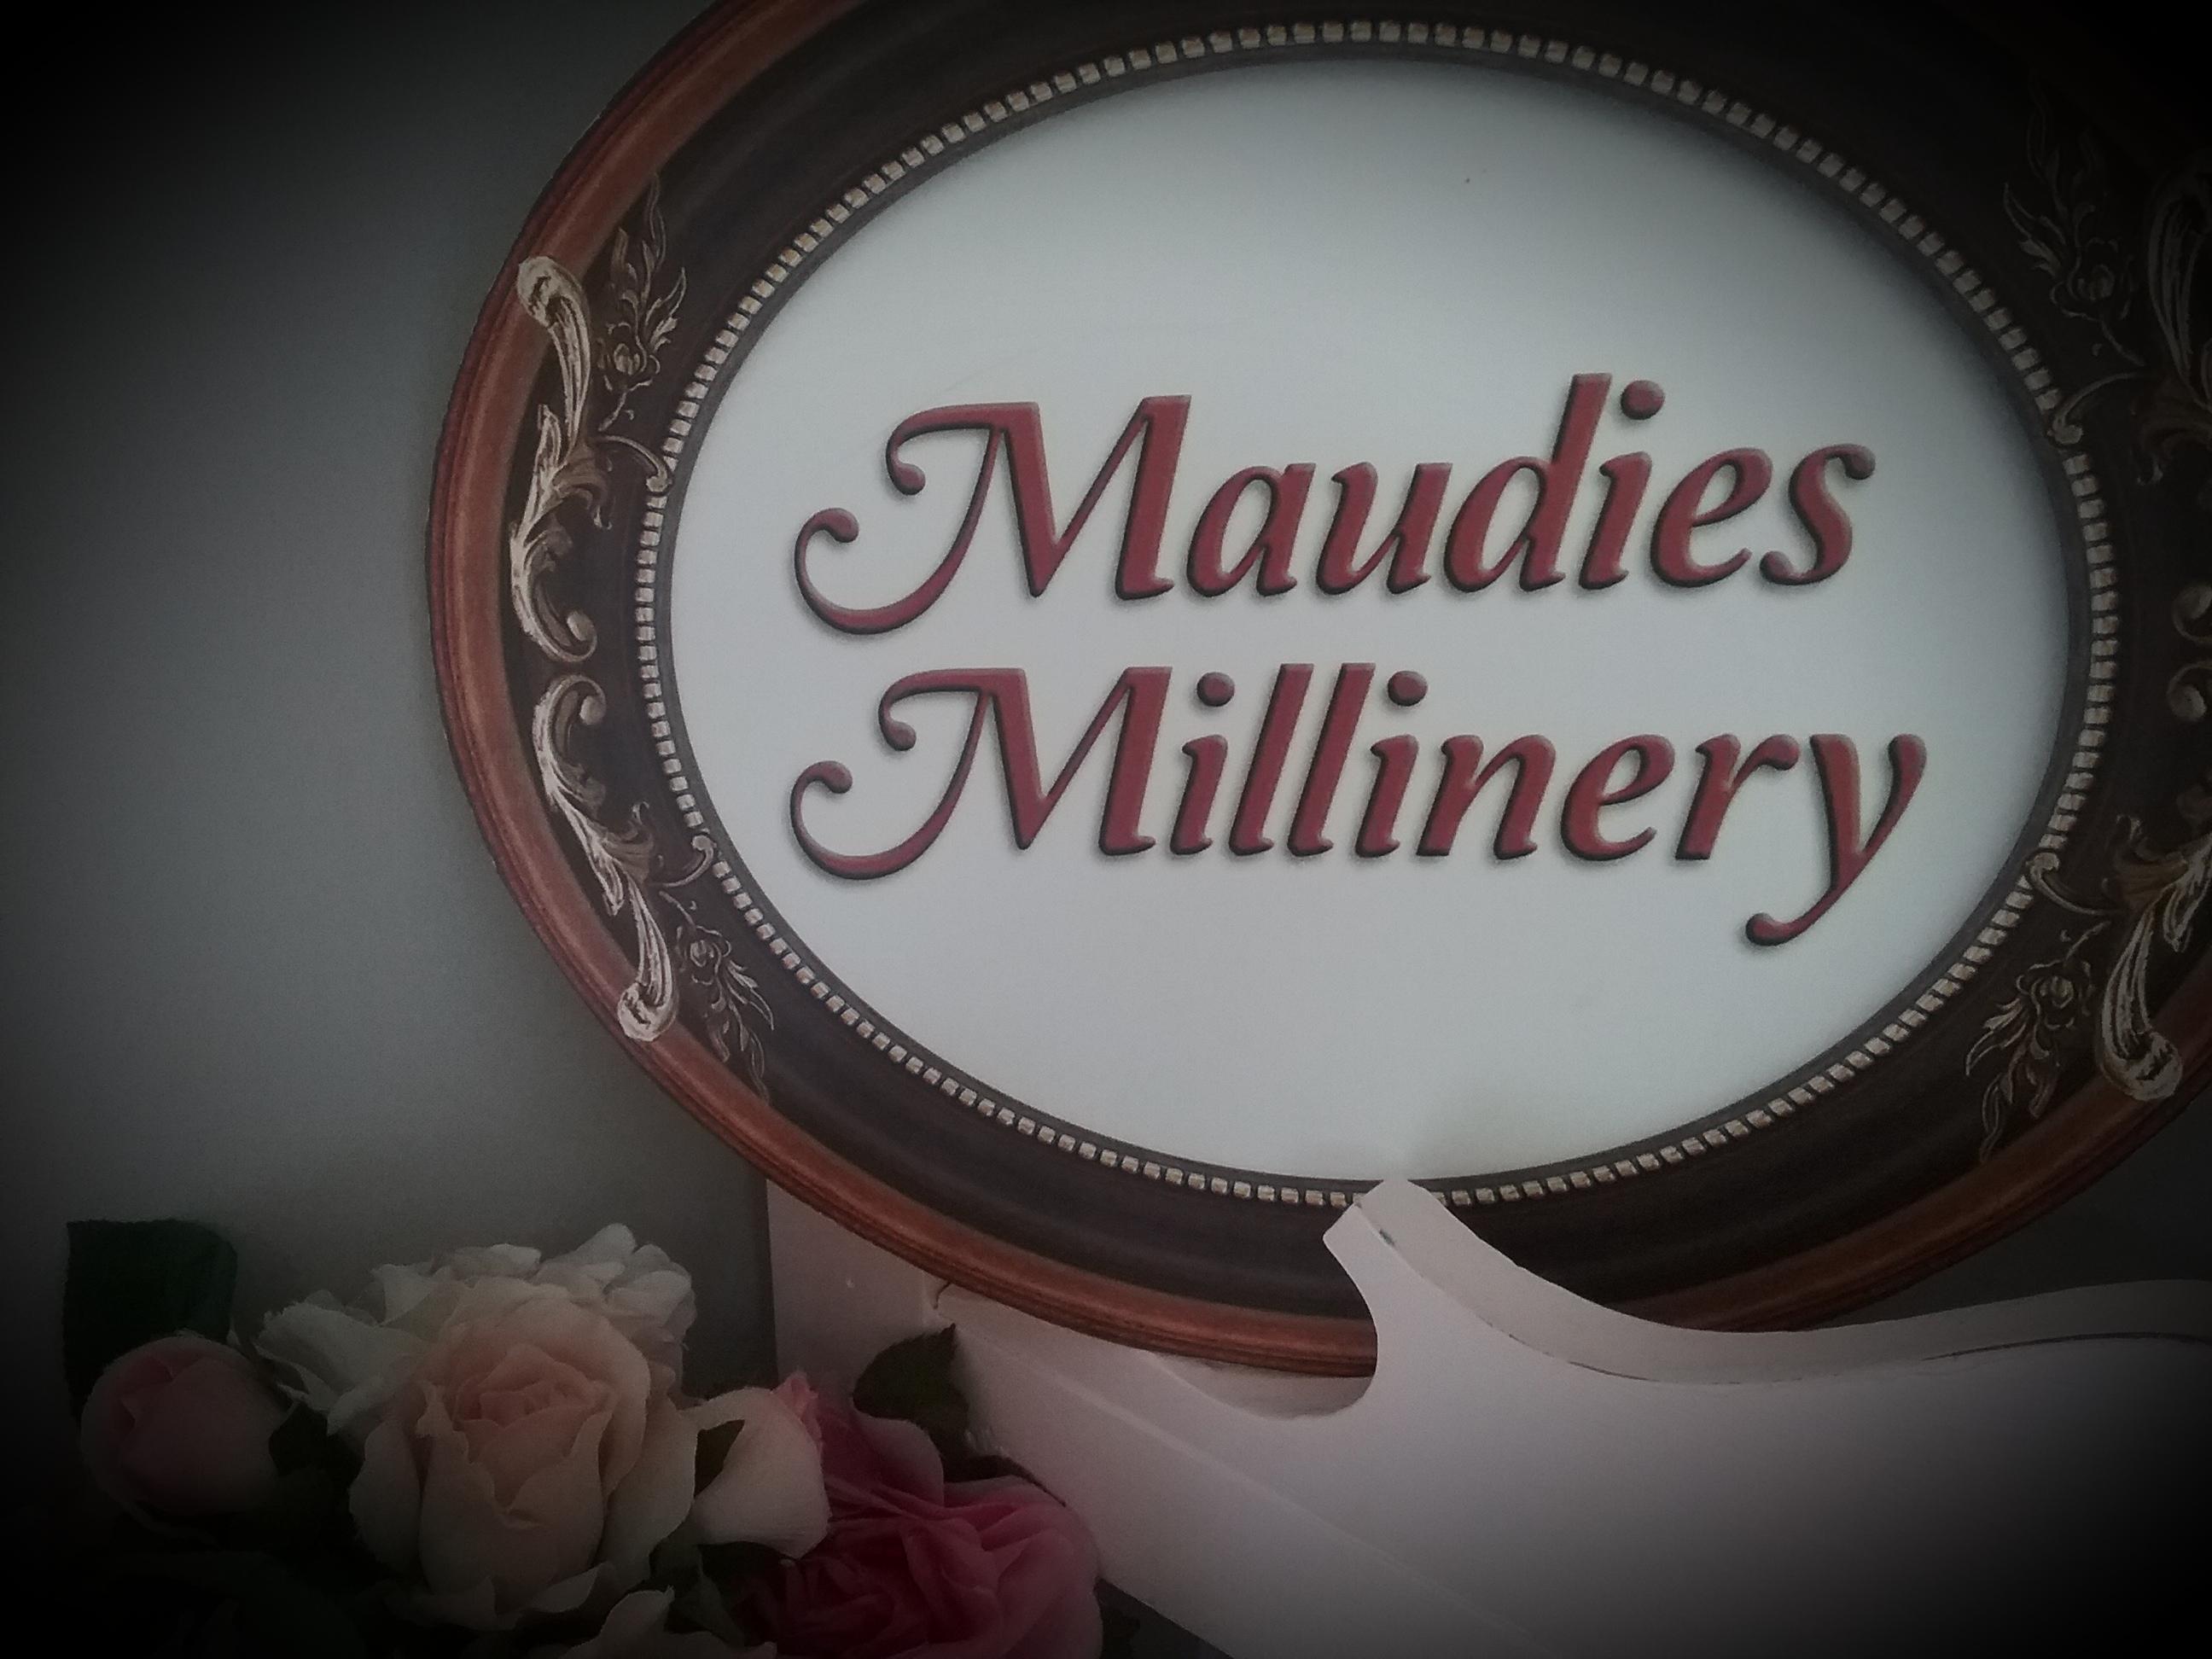 Maudies Millinery